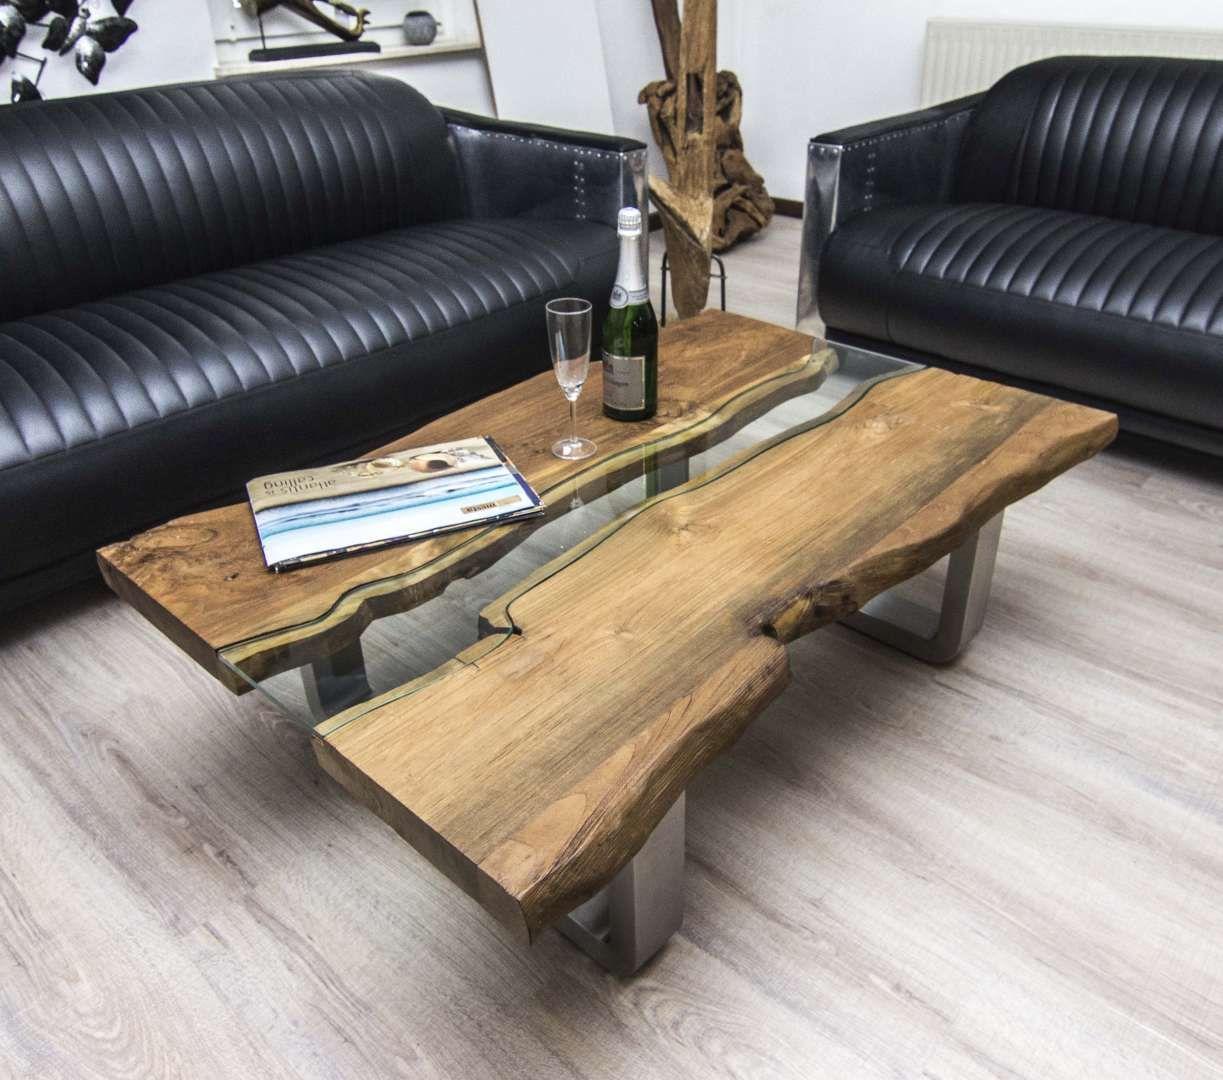 couchtisch teak altholz einrichtung pinterest. Black Bedroom Furniture Sets. Home Design Ideas